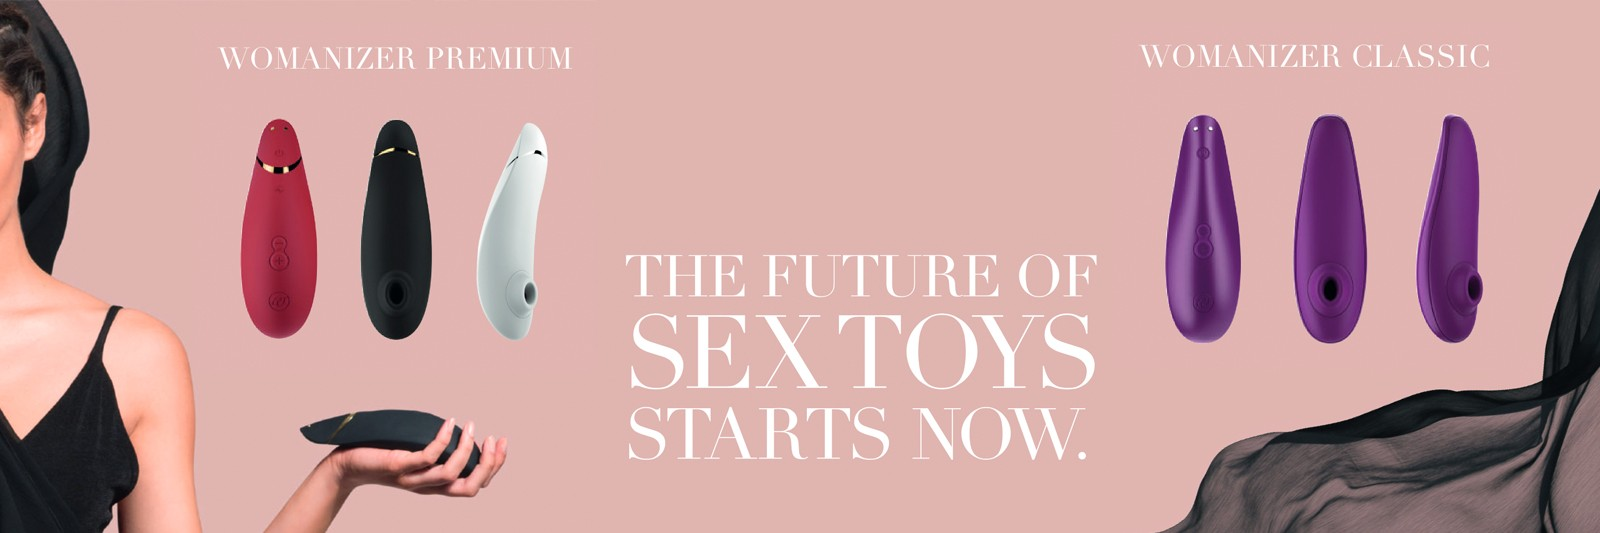 Womanizer Sex Toys